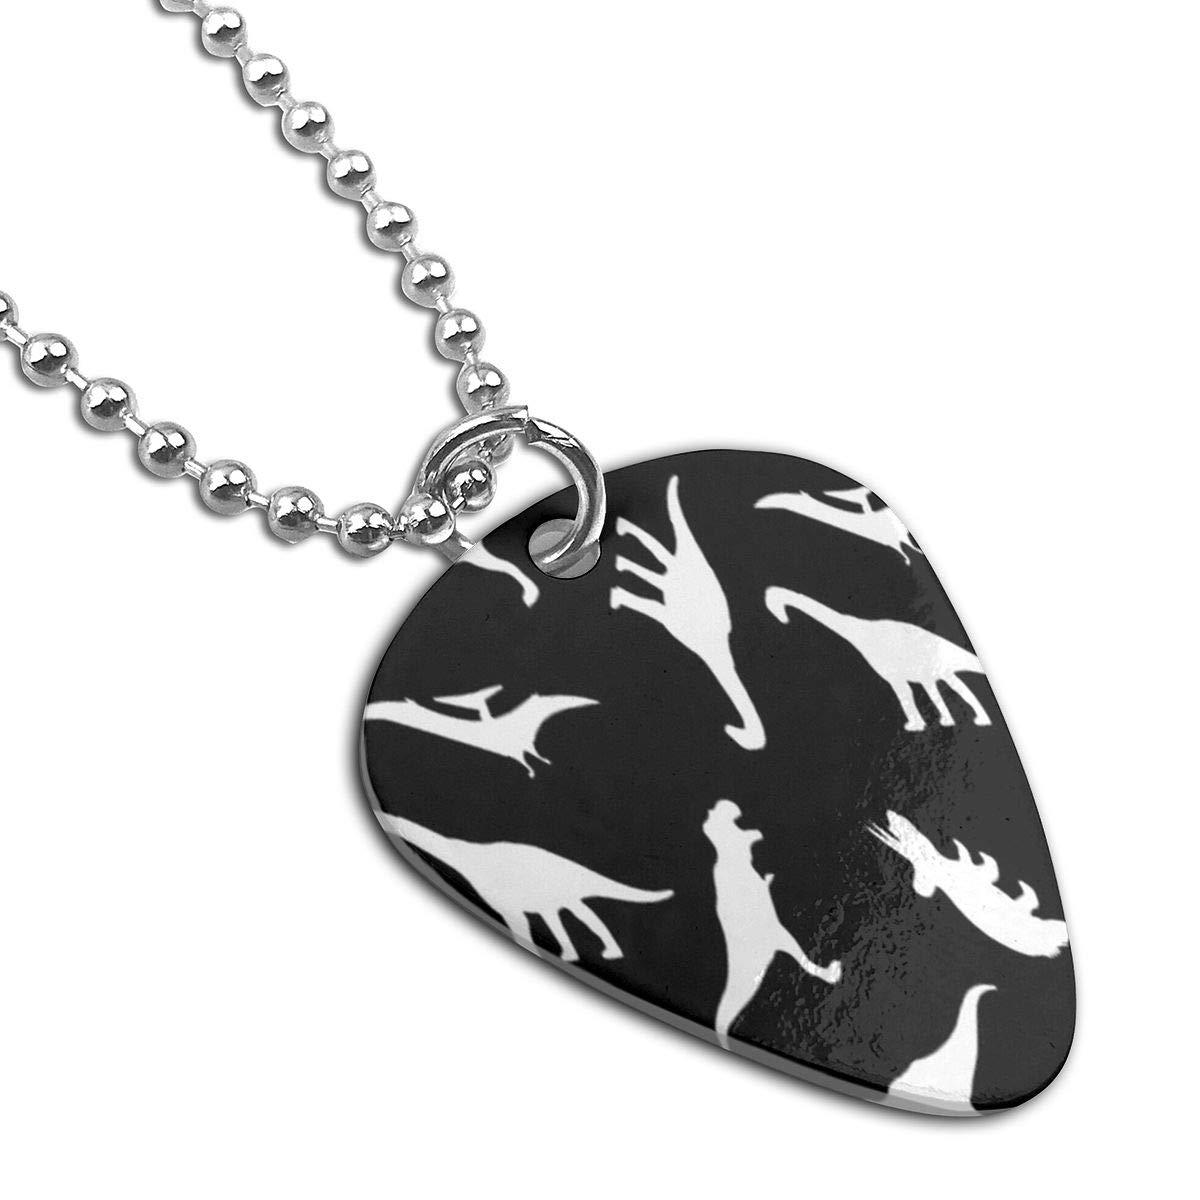 Dinosaurs Cute Dino Custom Guitar Pick Pendant Necklace Keychain